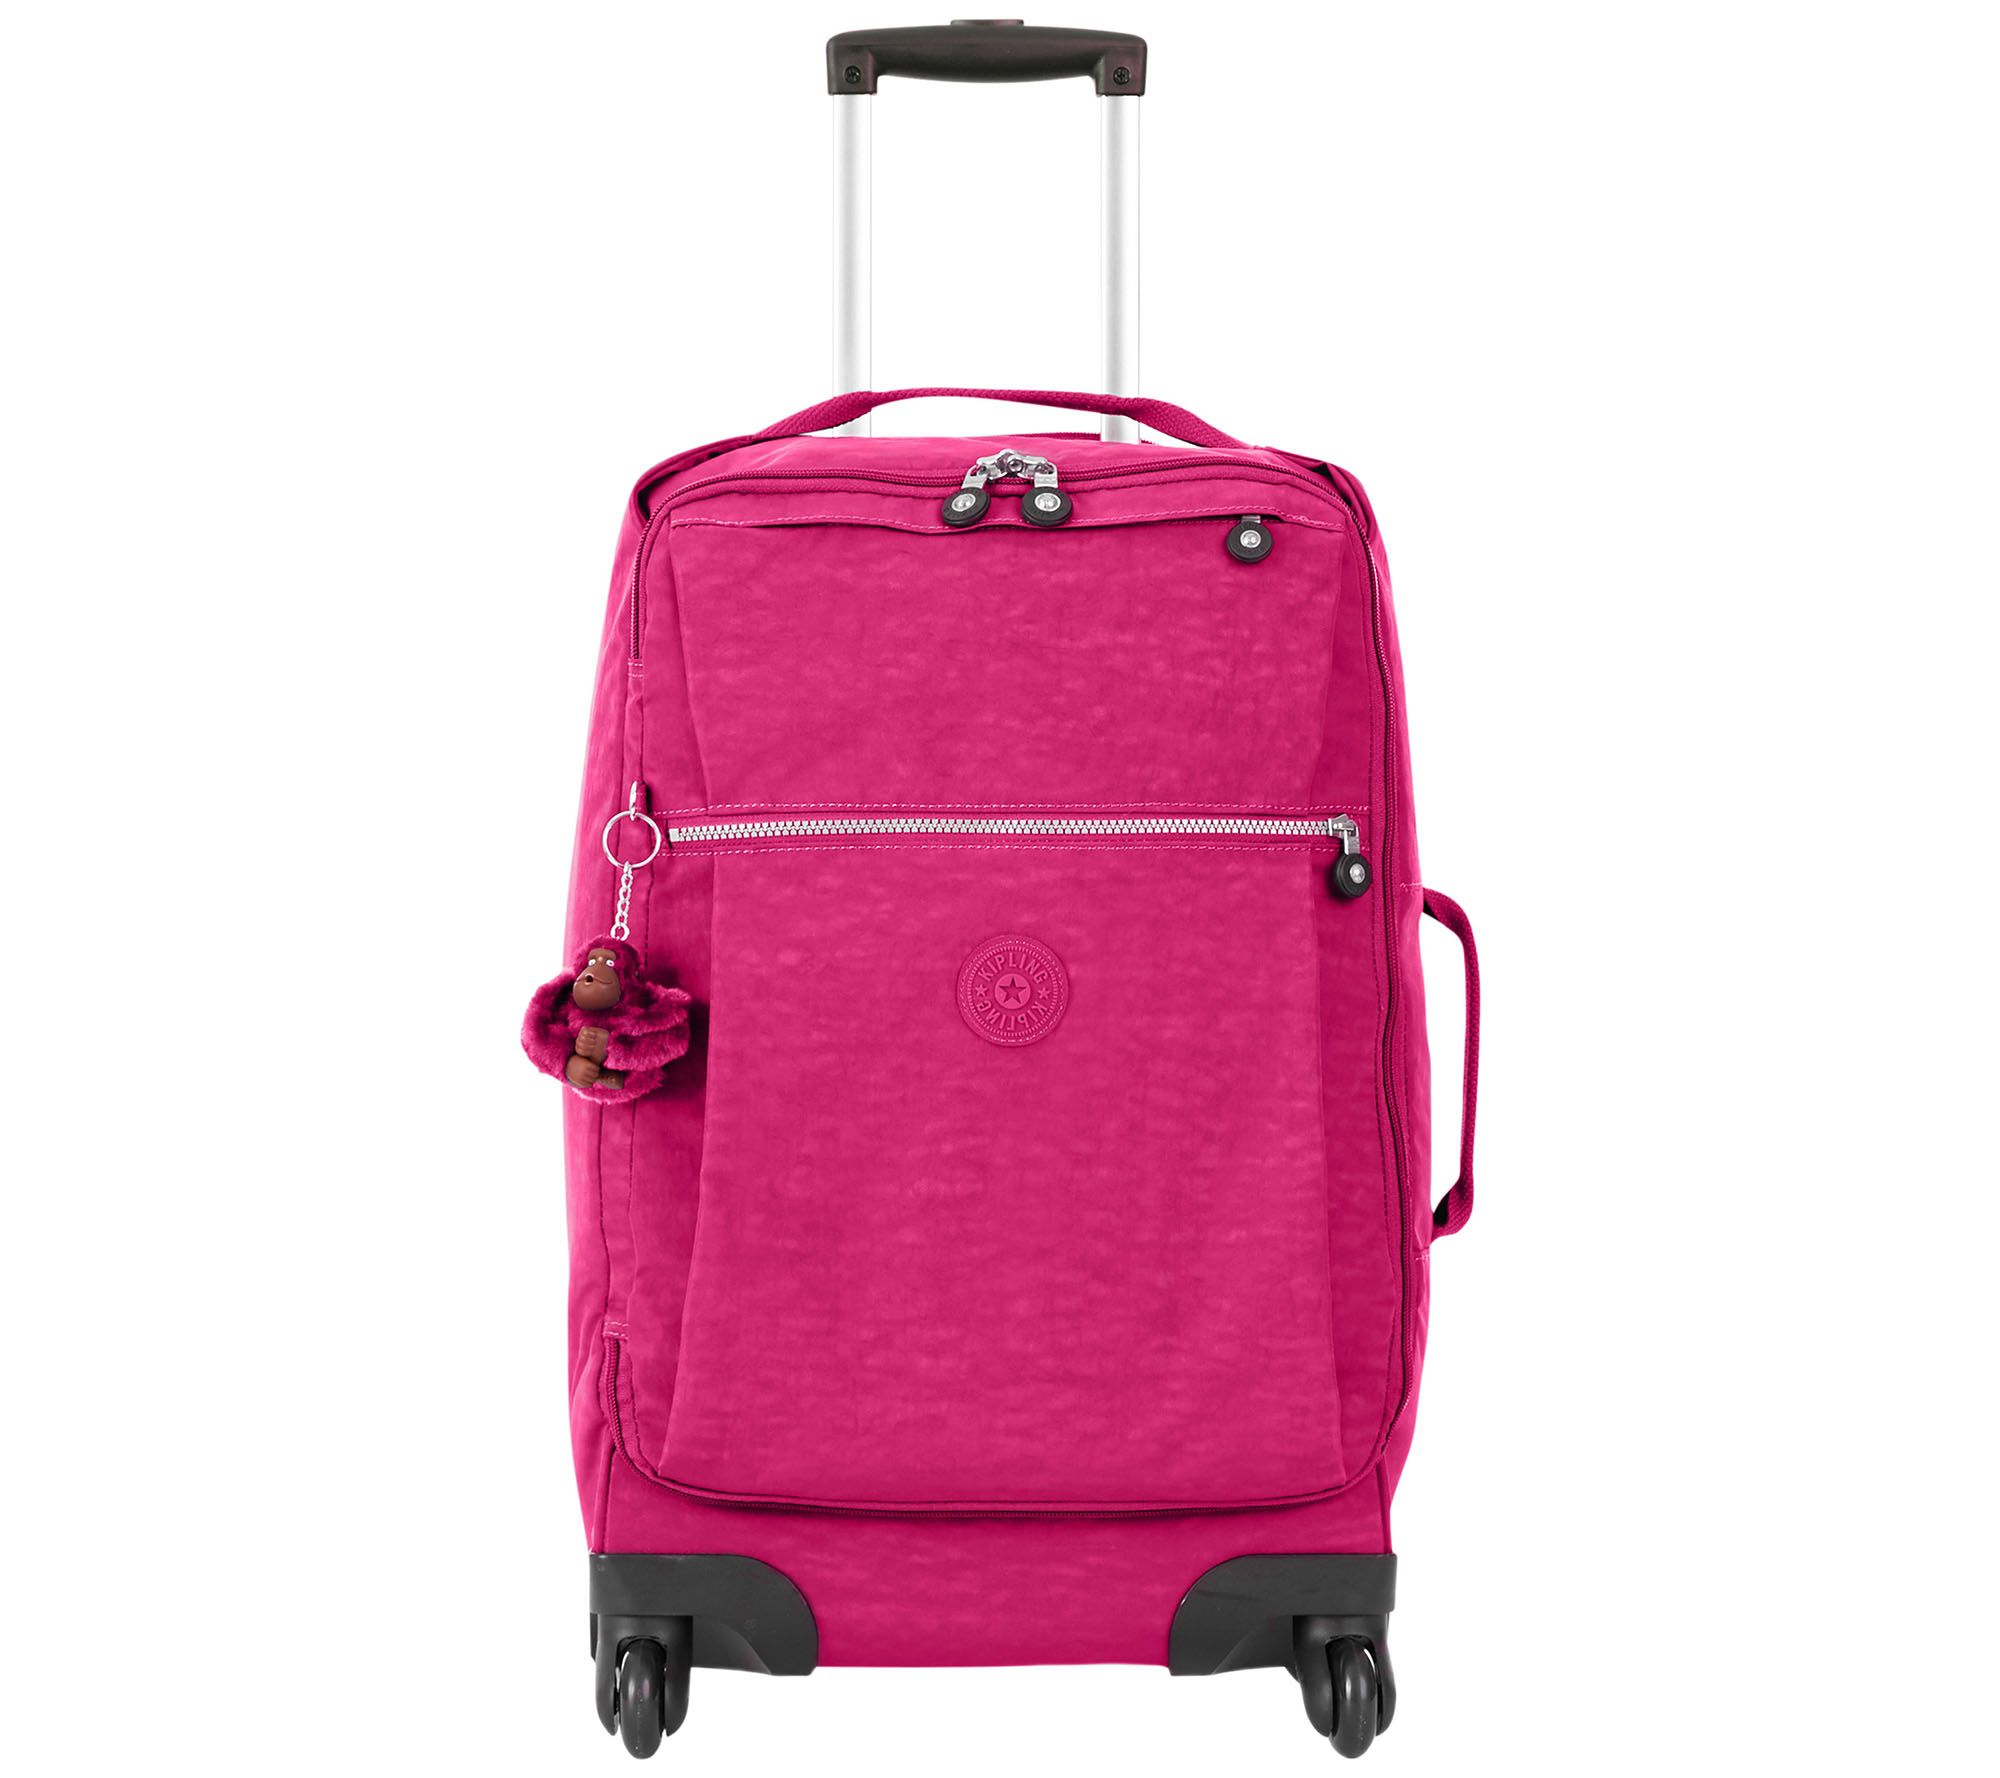 d2d495d024 Kipling Nylon Small Carry On Luggage - Darcey S — QVC.com